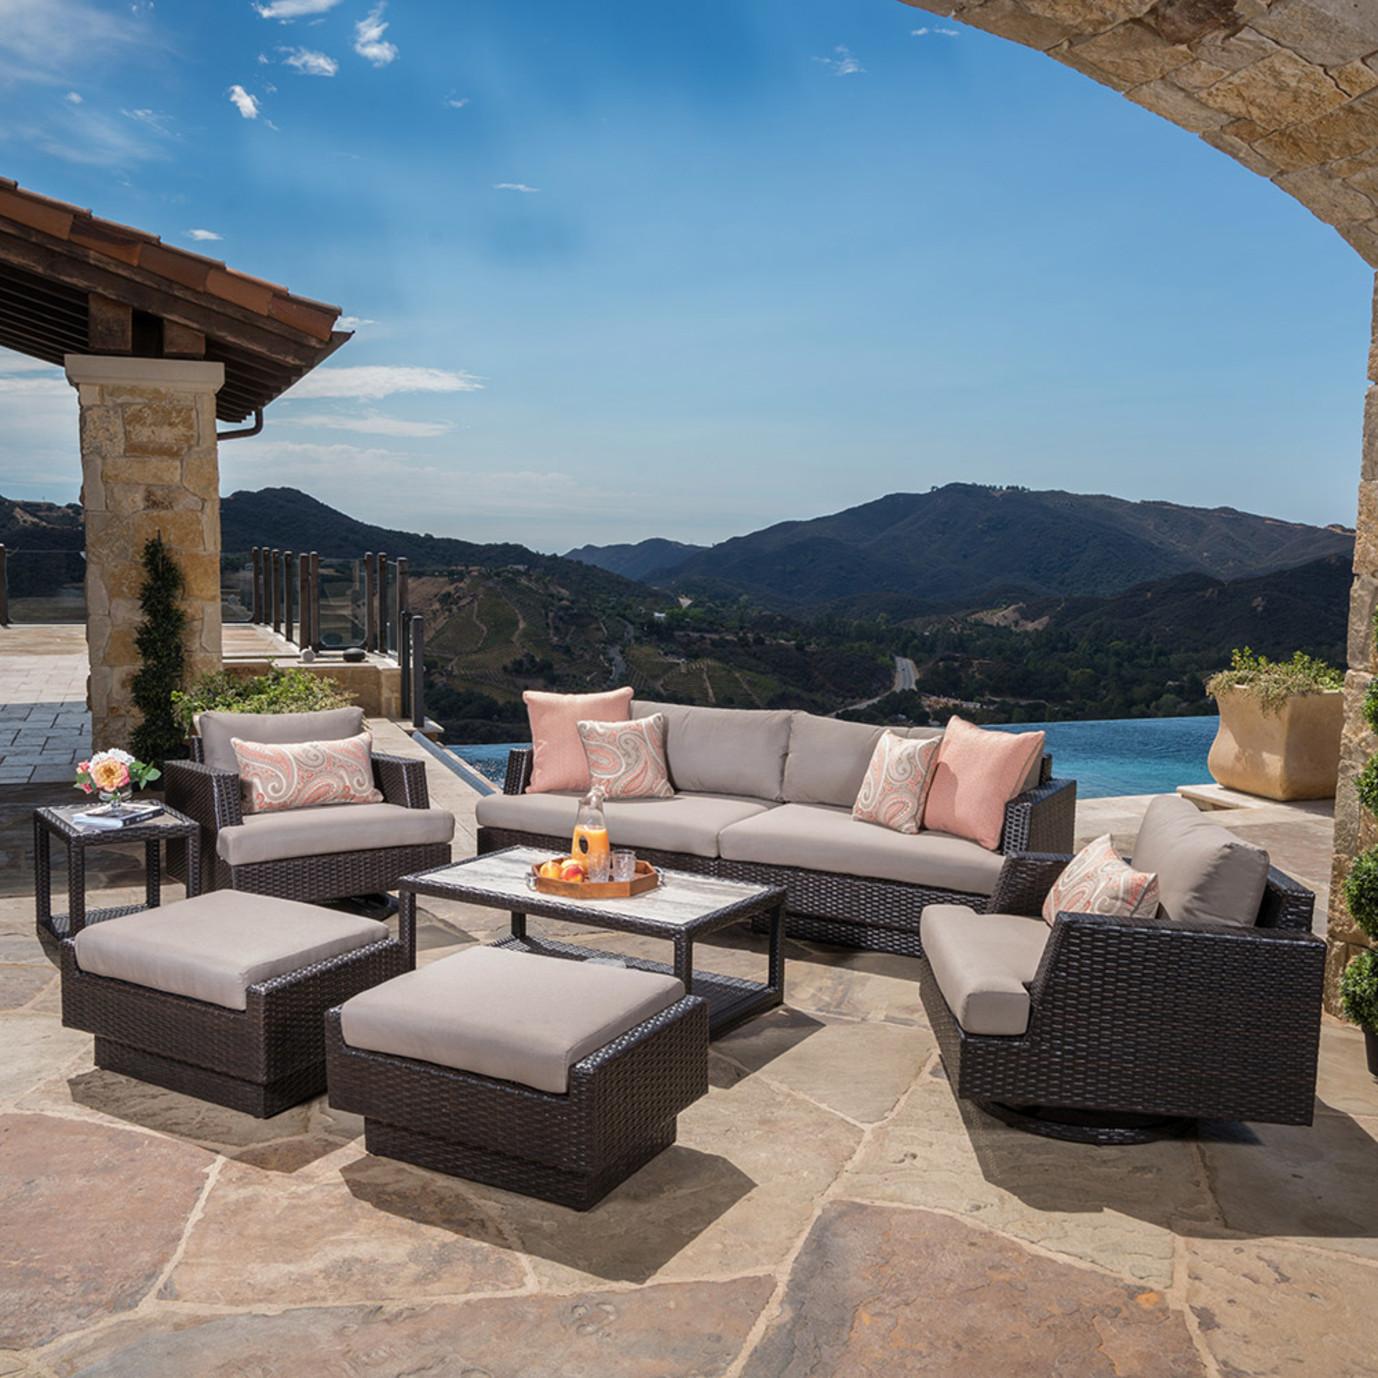 Portofino Comfort 8pc Motion Club Seating Set in Espresso Taupe ...